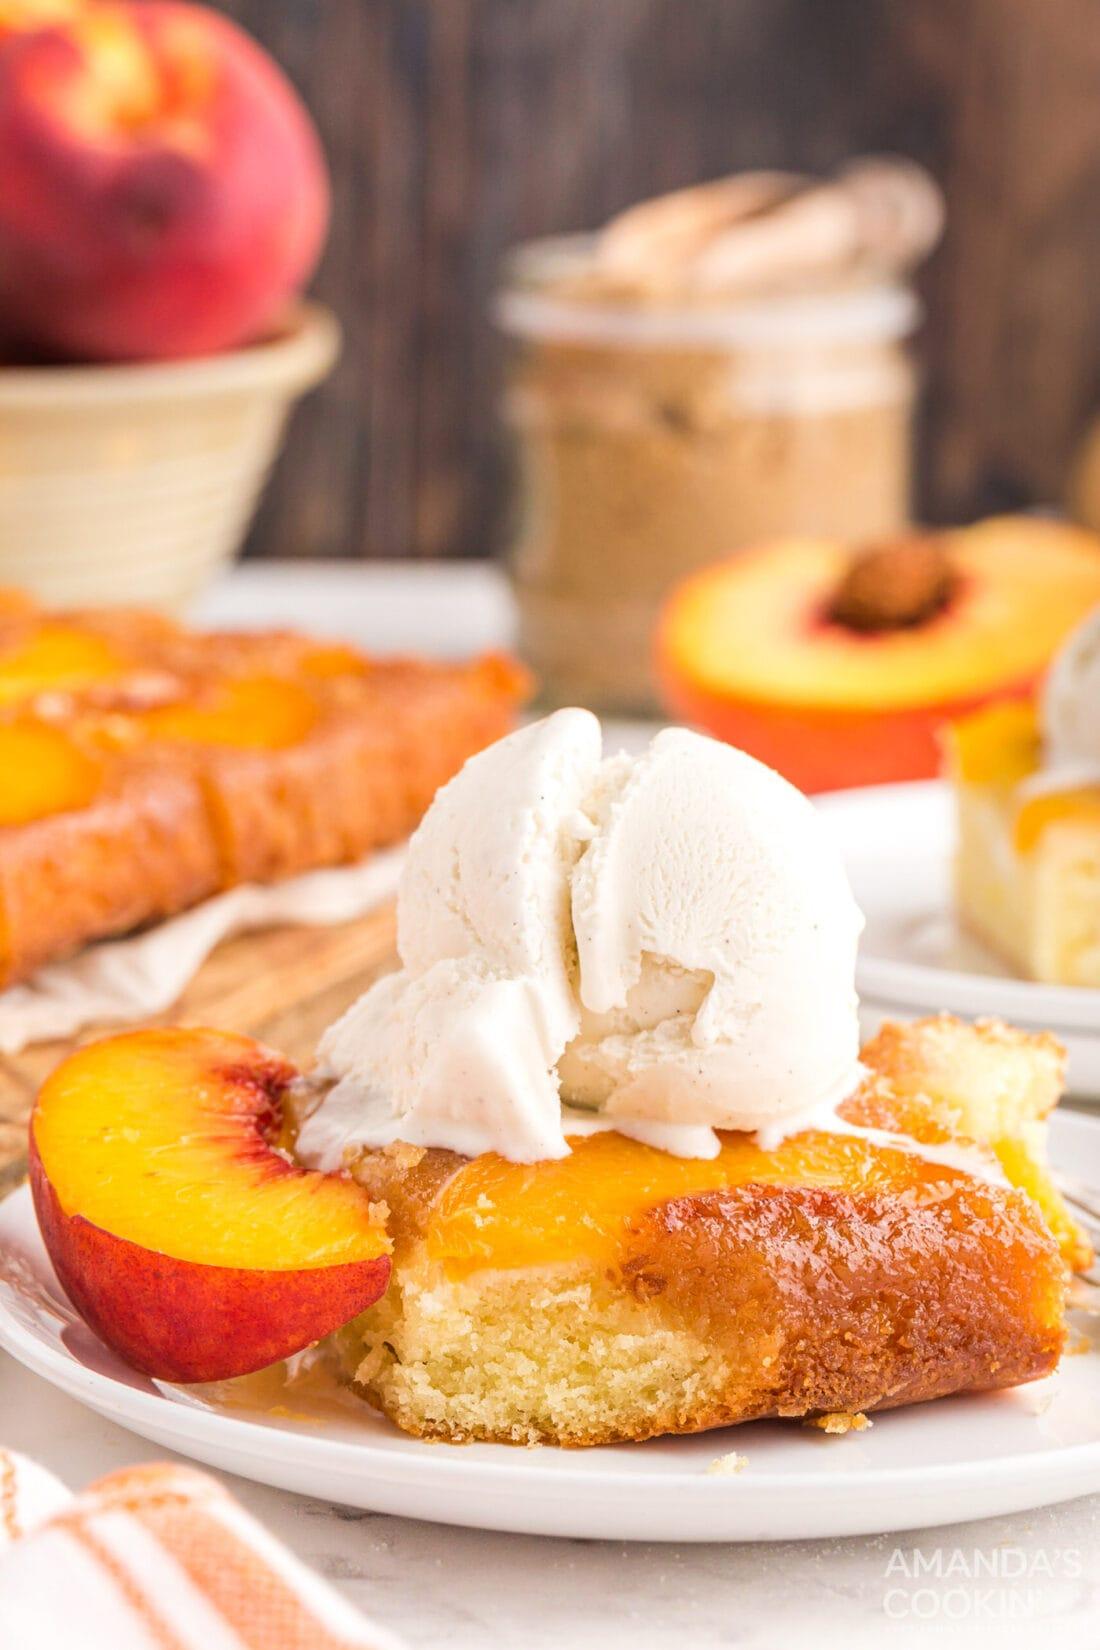 slice of Peach Upside Down Cake with ice cream